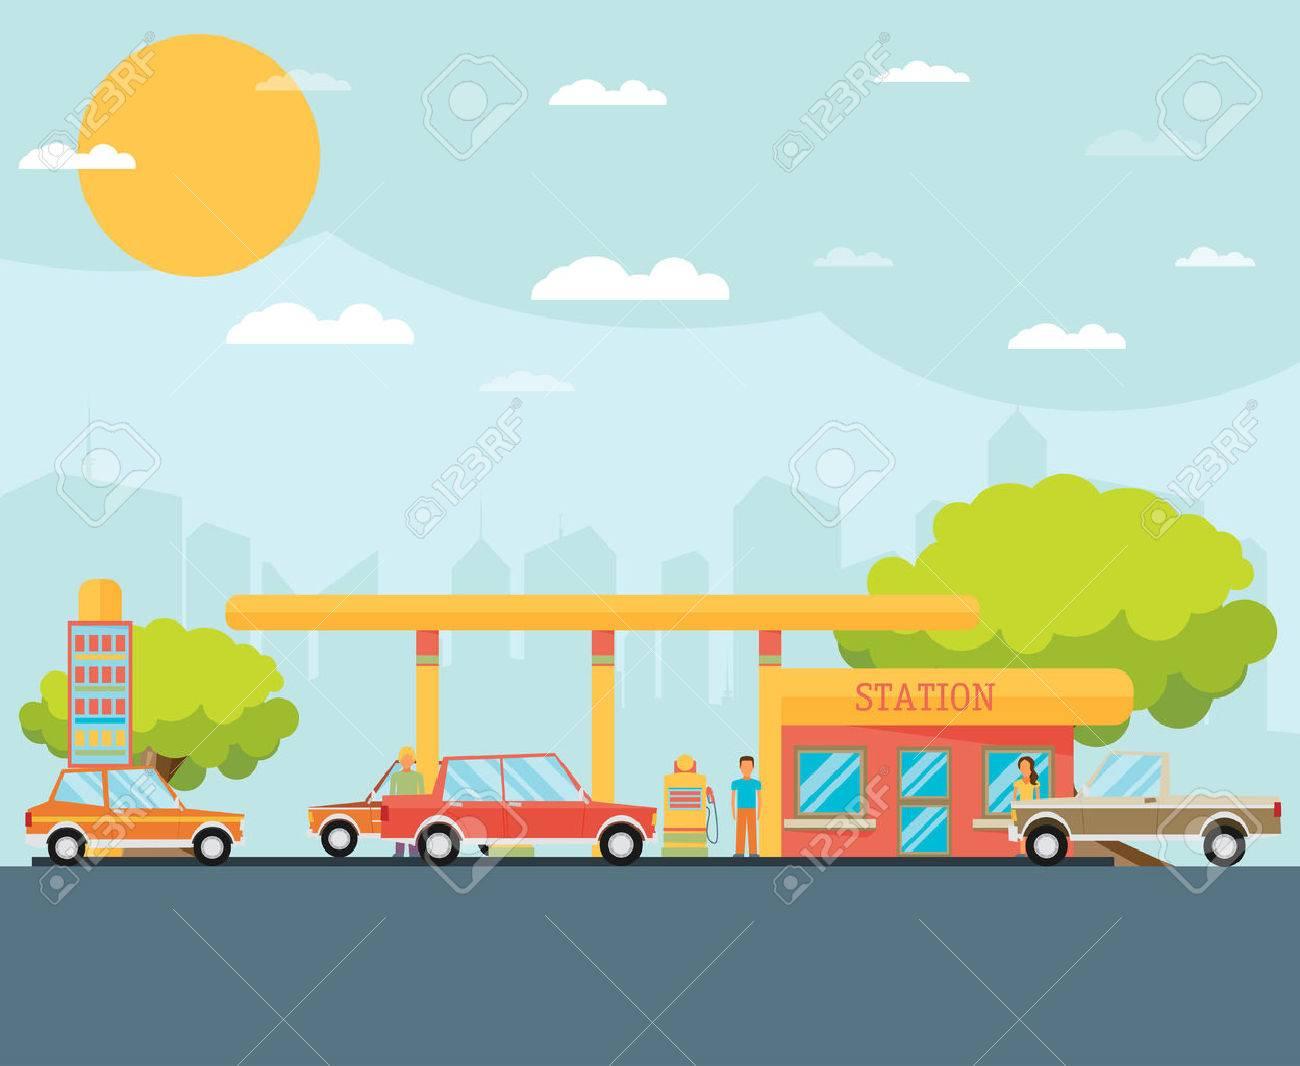 Gas station vector illustration - 42156393